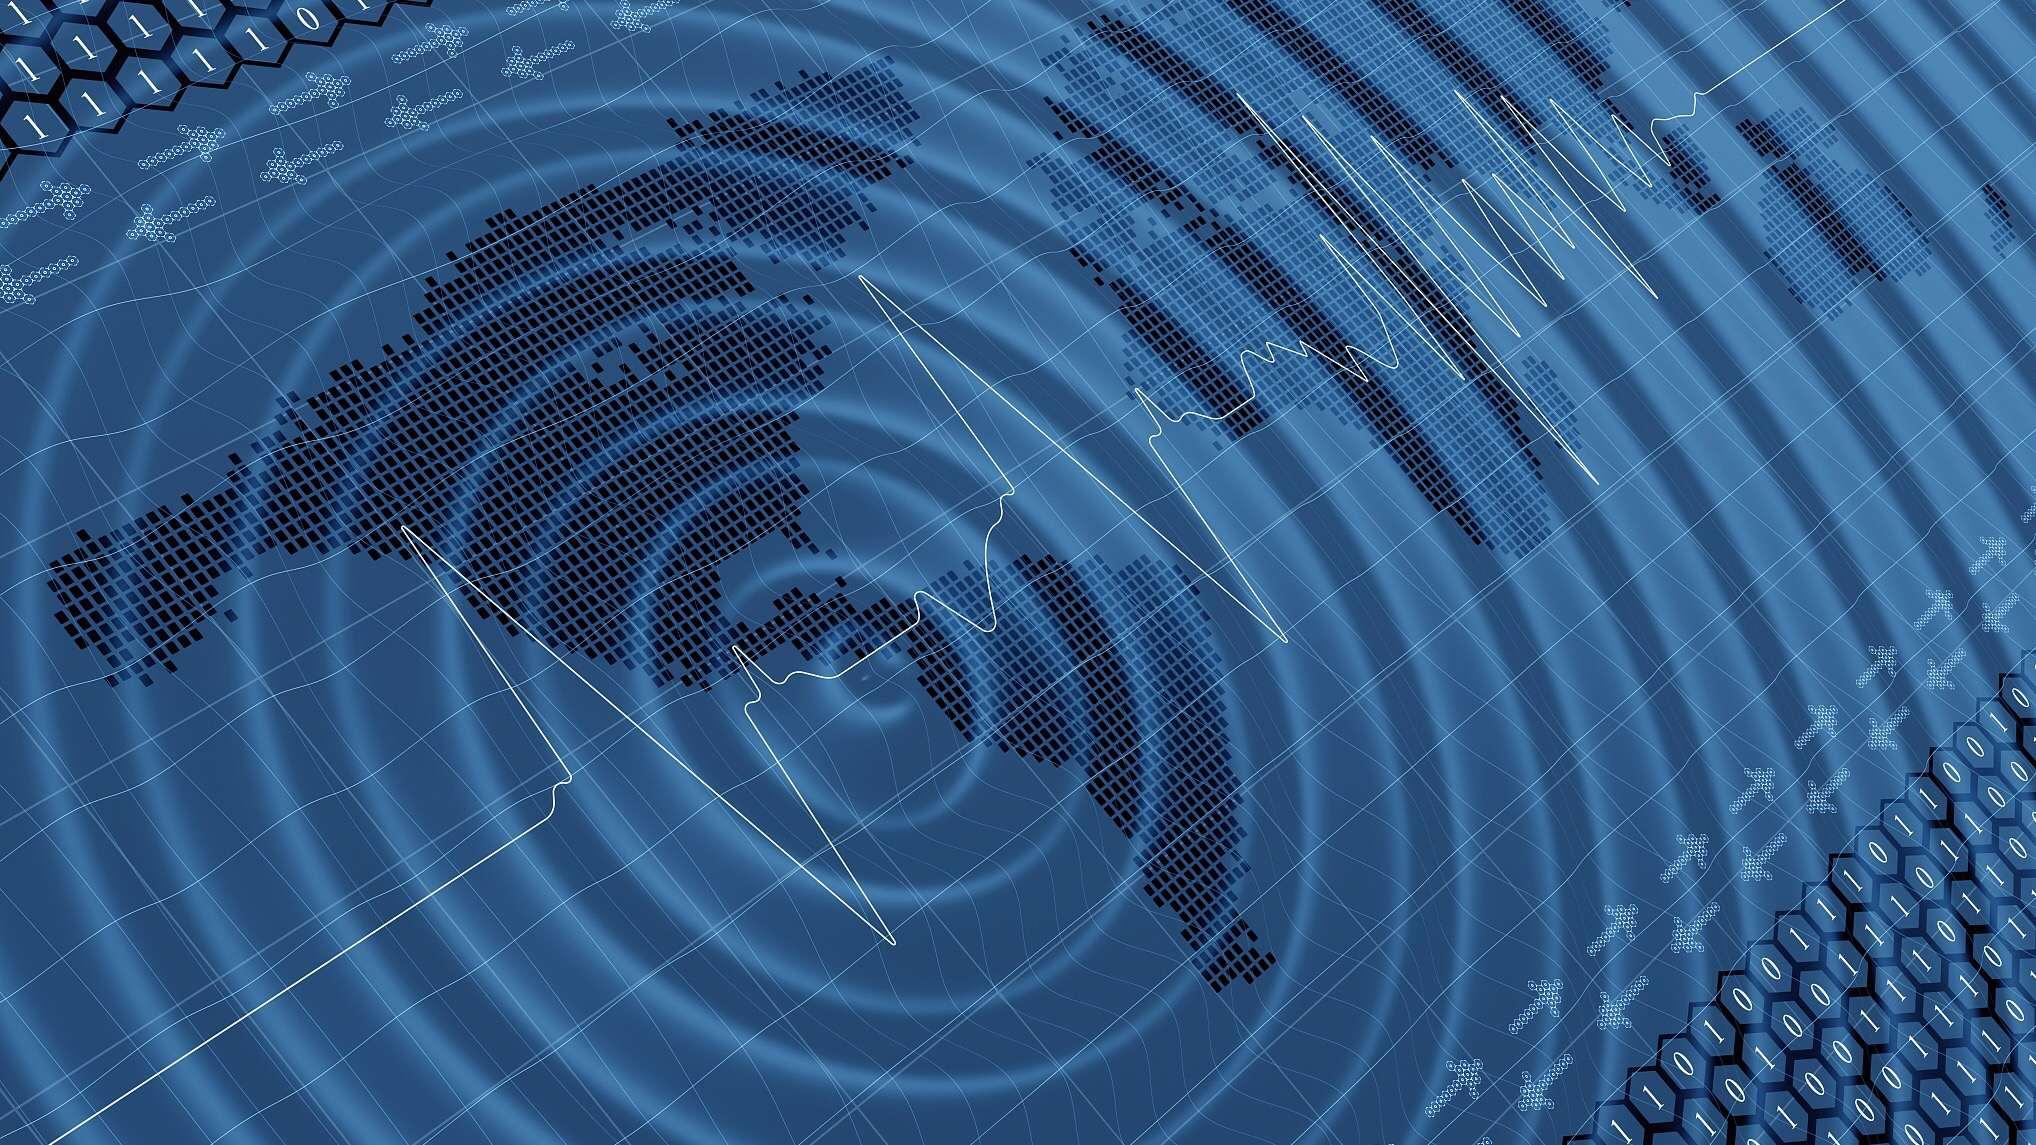 5.7-magnitude quake hits Southeast of Easter Island: USGS